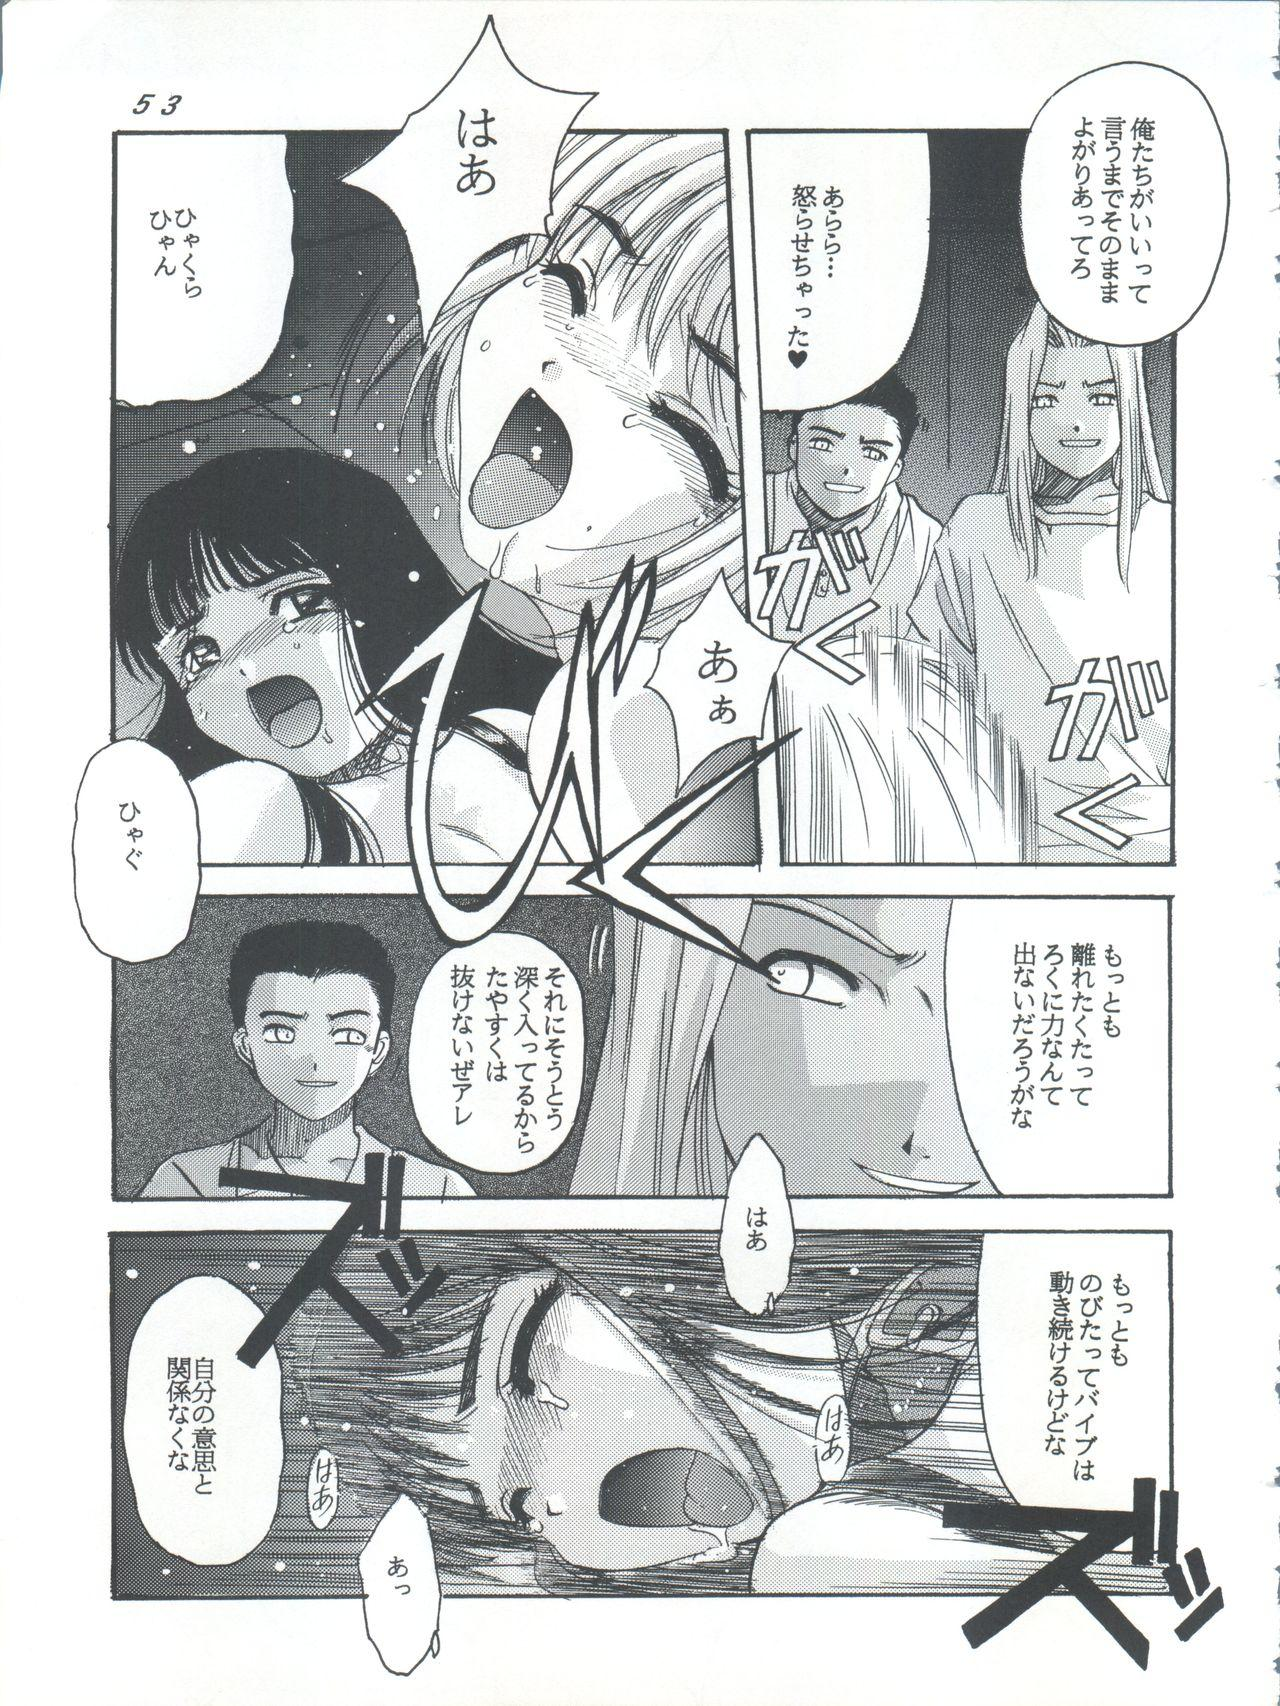 Card Captor Sakura Act 3 Green Version 52